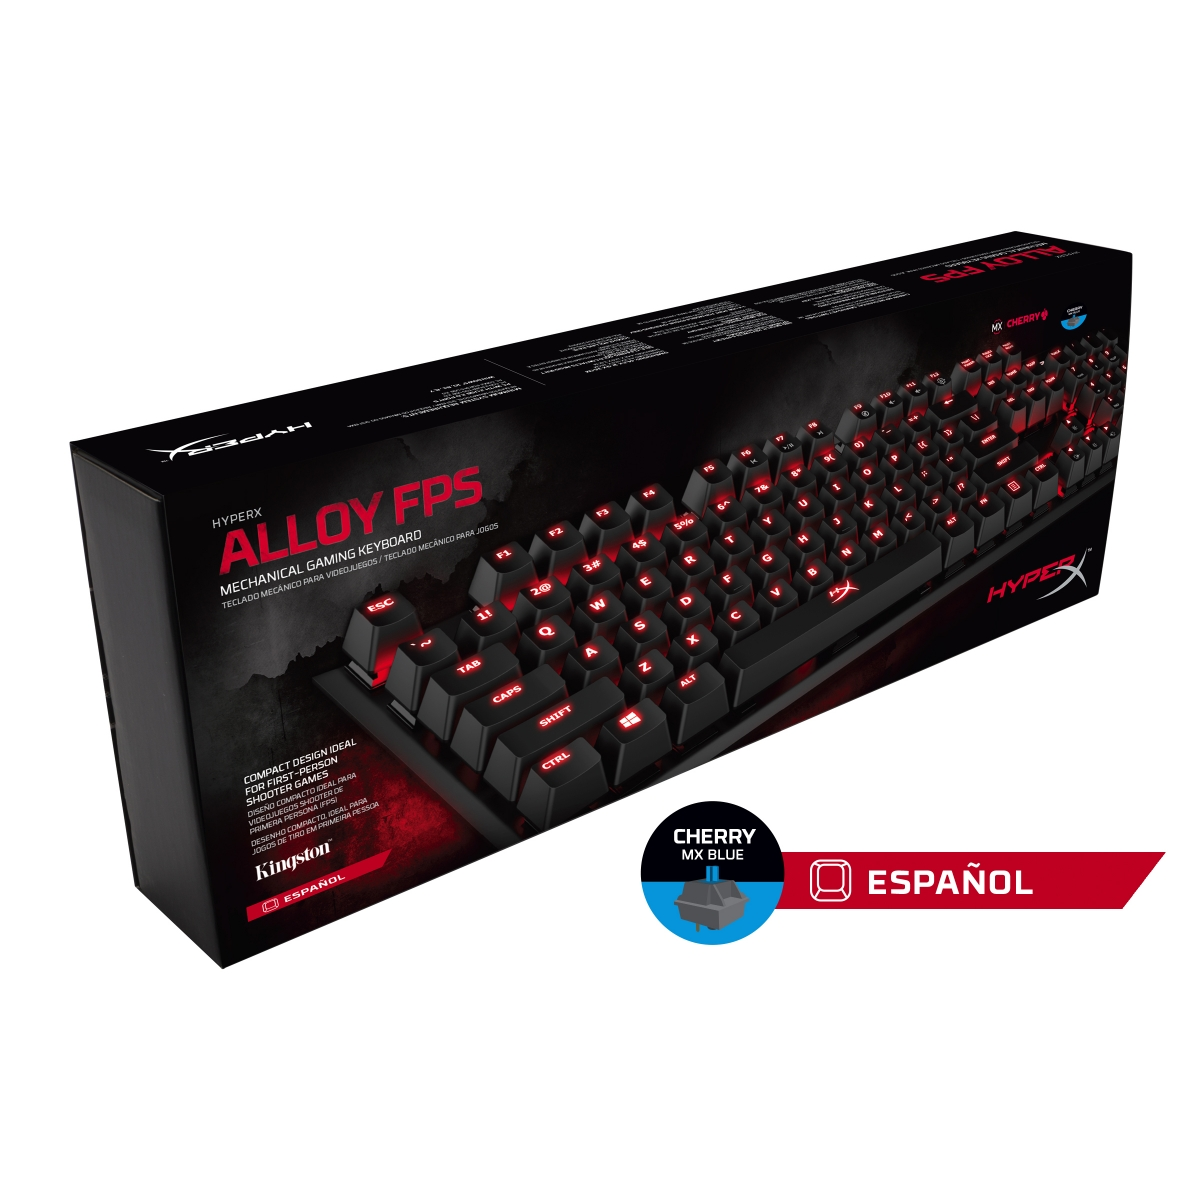 Teclado Mecânico Gamer HyperX Alloy FPS, Switch Cherry MX Blue, HX-KB1BL1-LA/A4